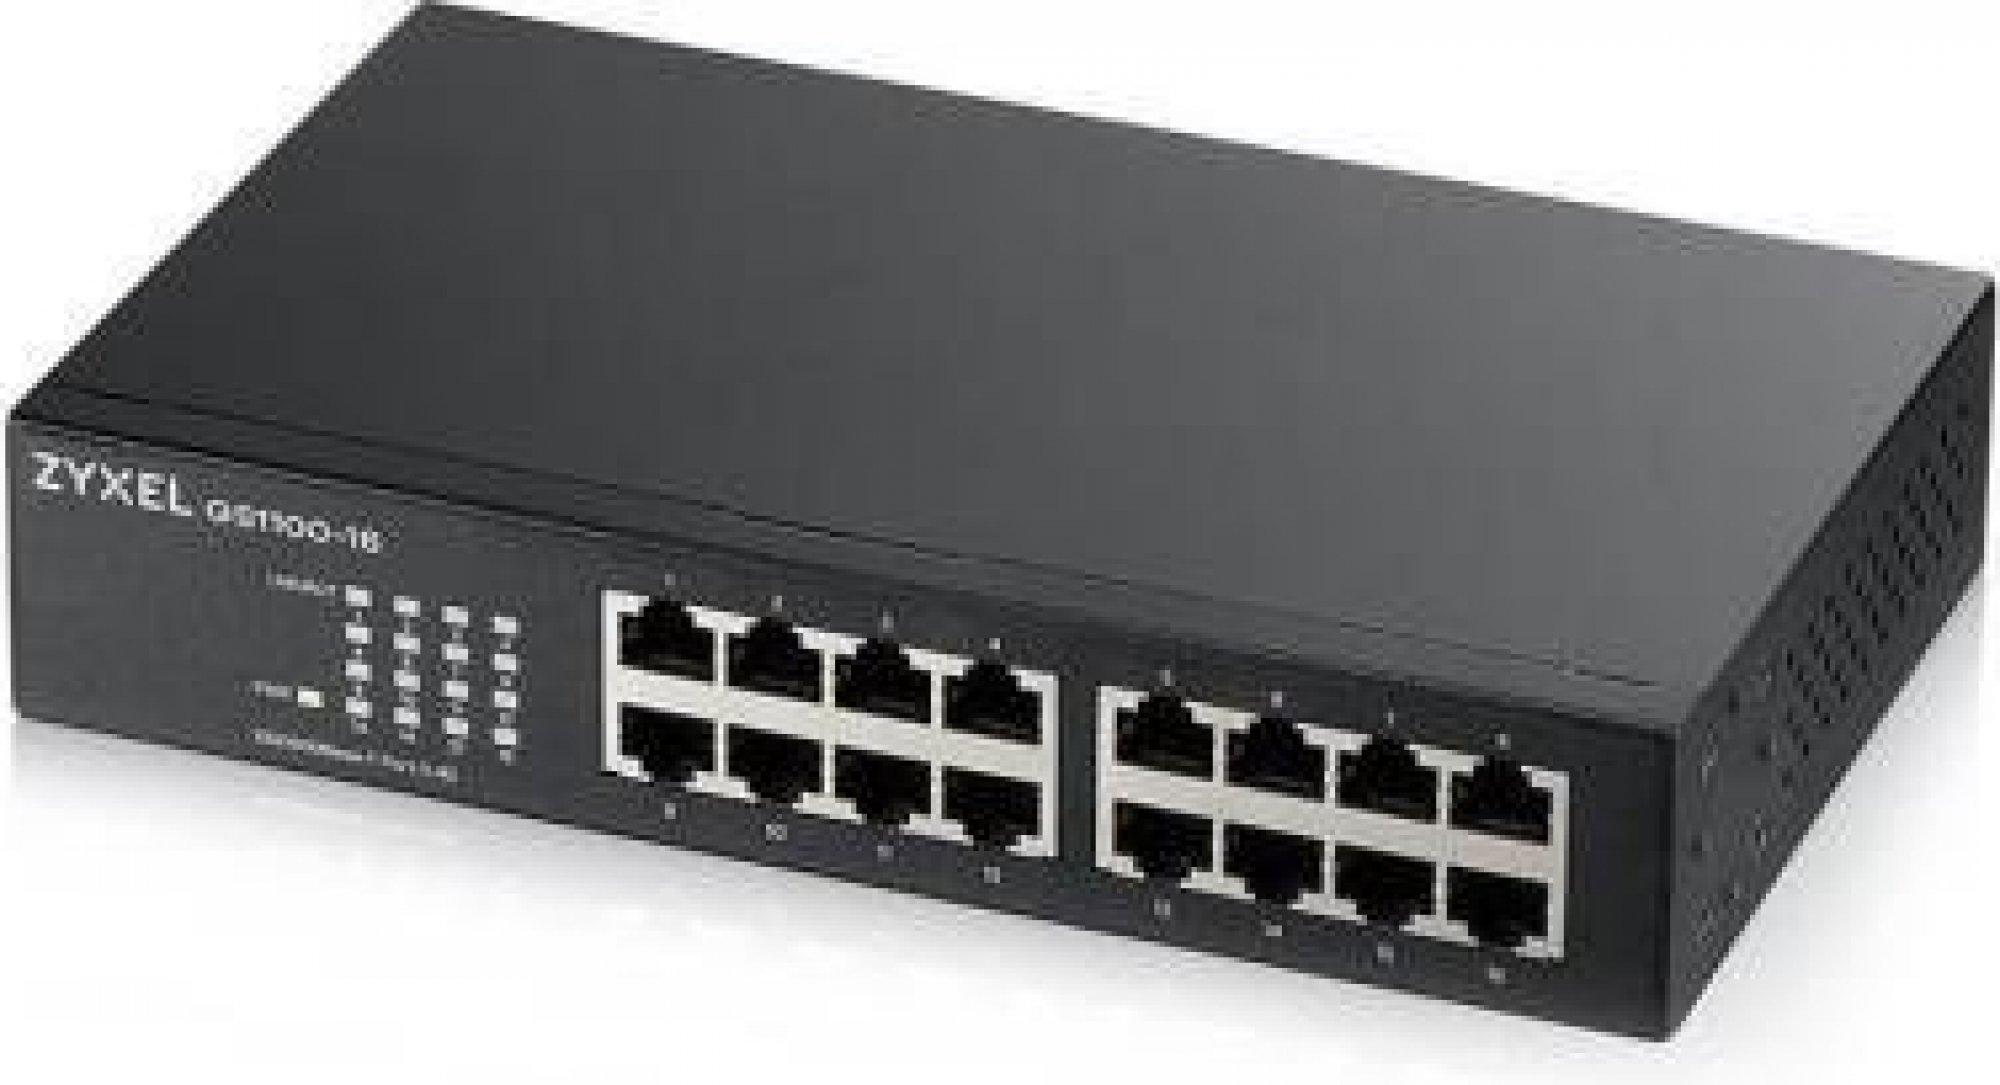 Zyxel GS1100-16, unmanaged v3